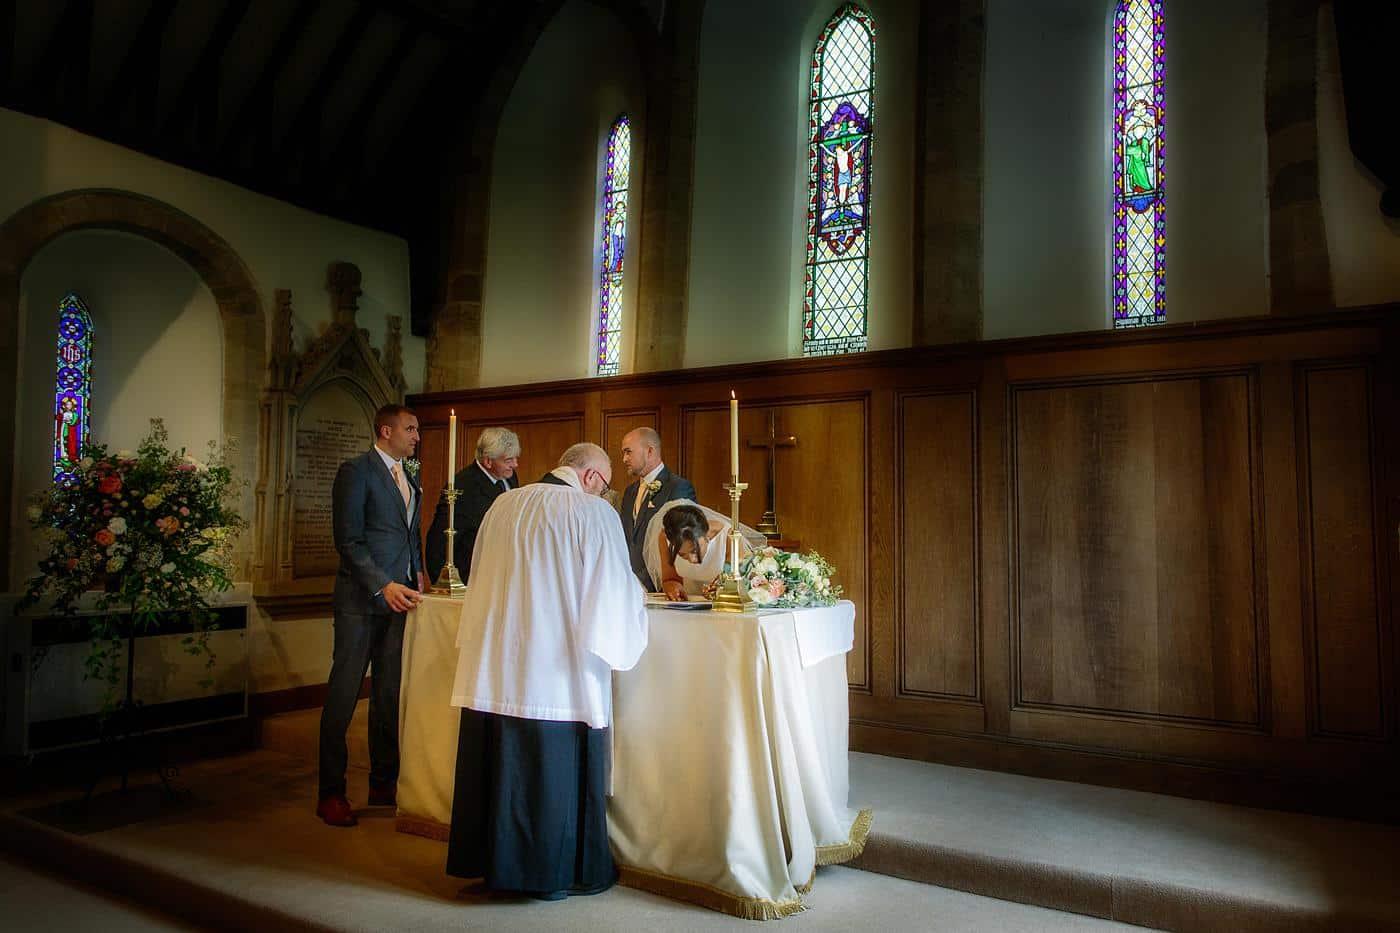 Winstanstow wedding photography 0456